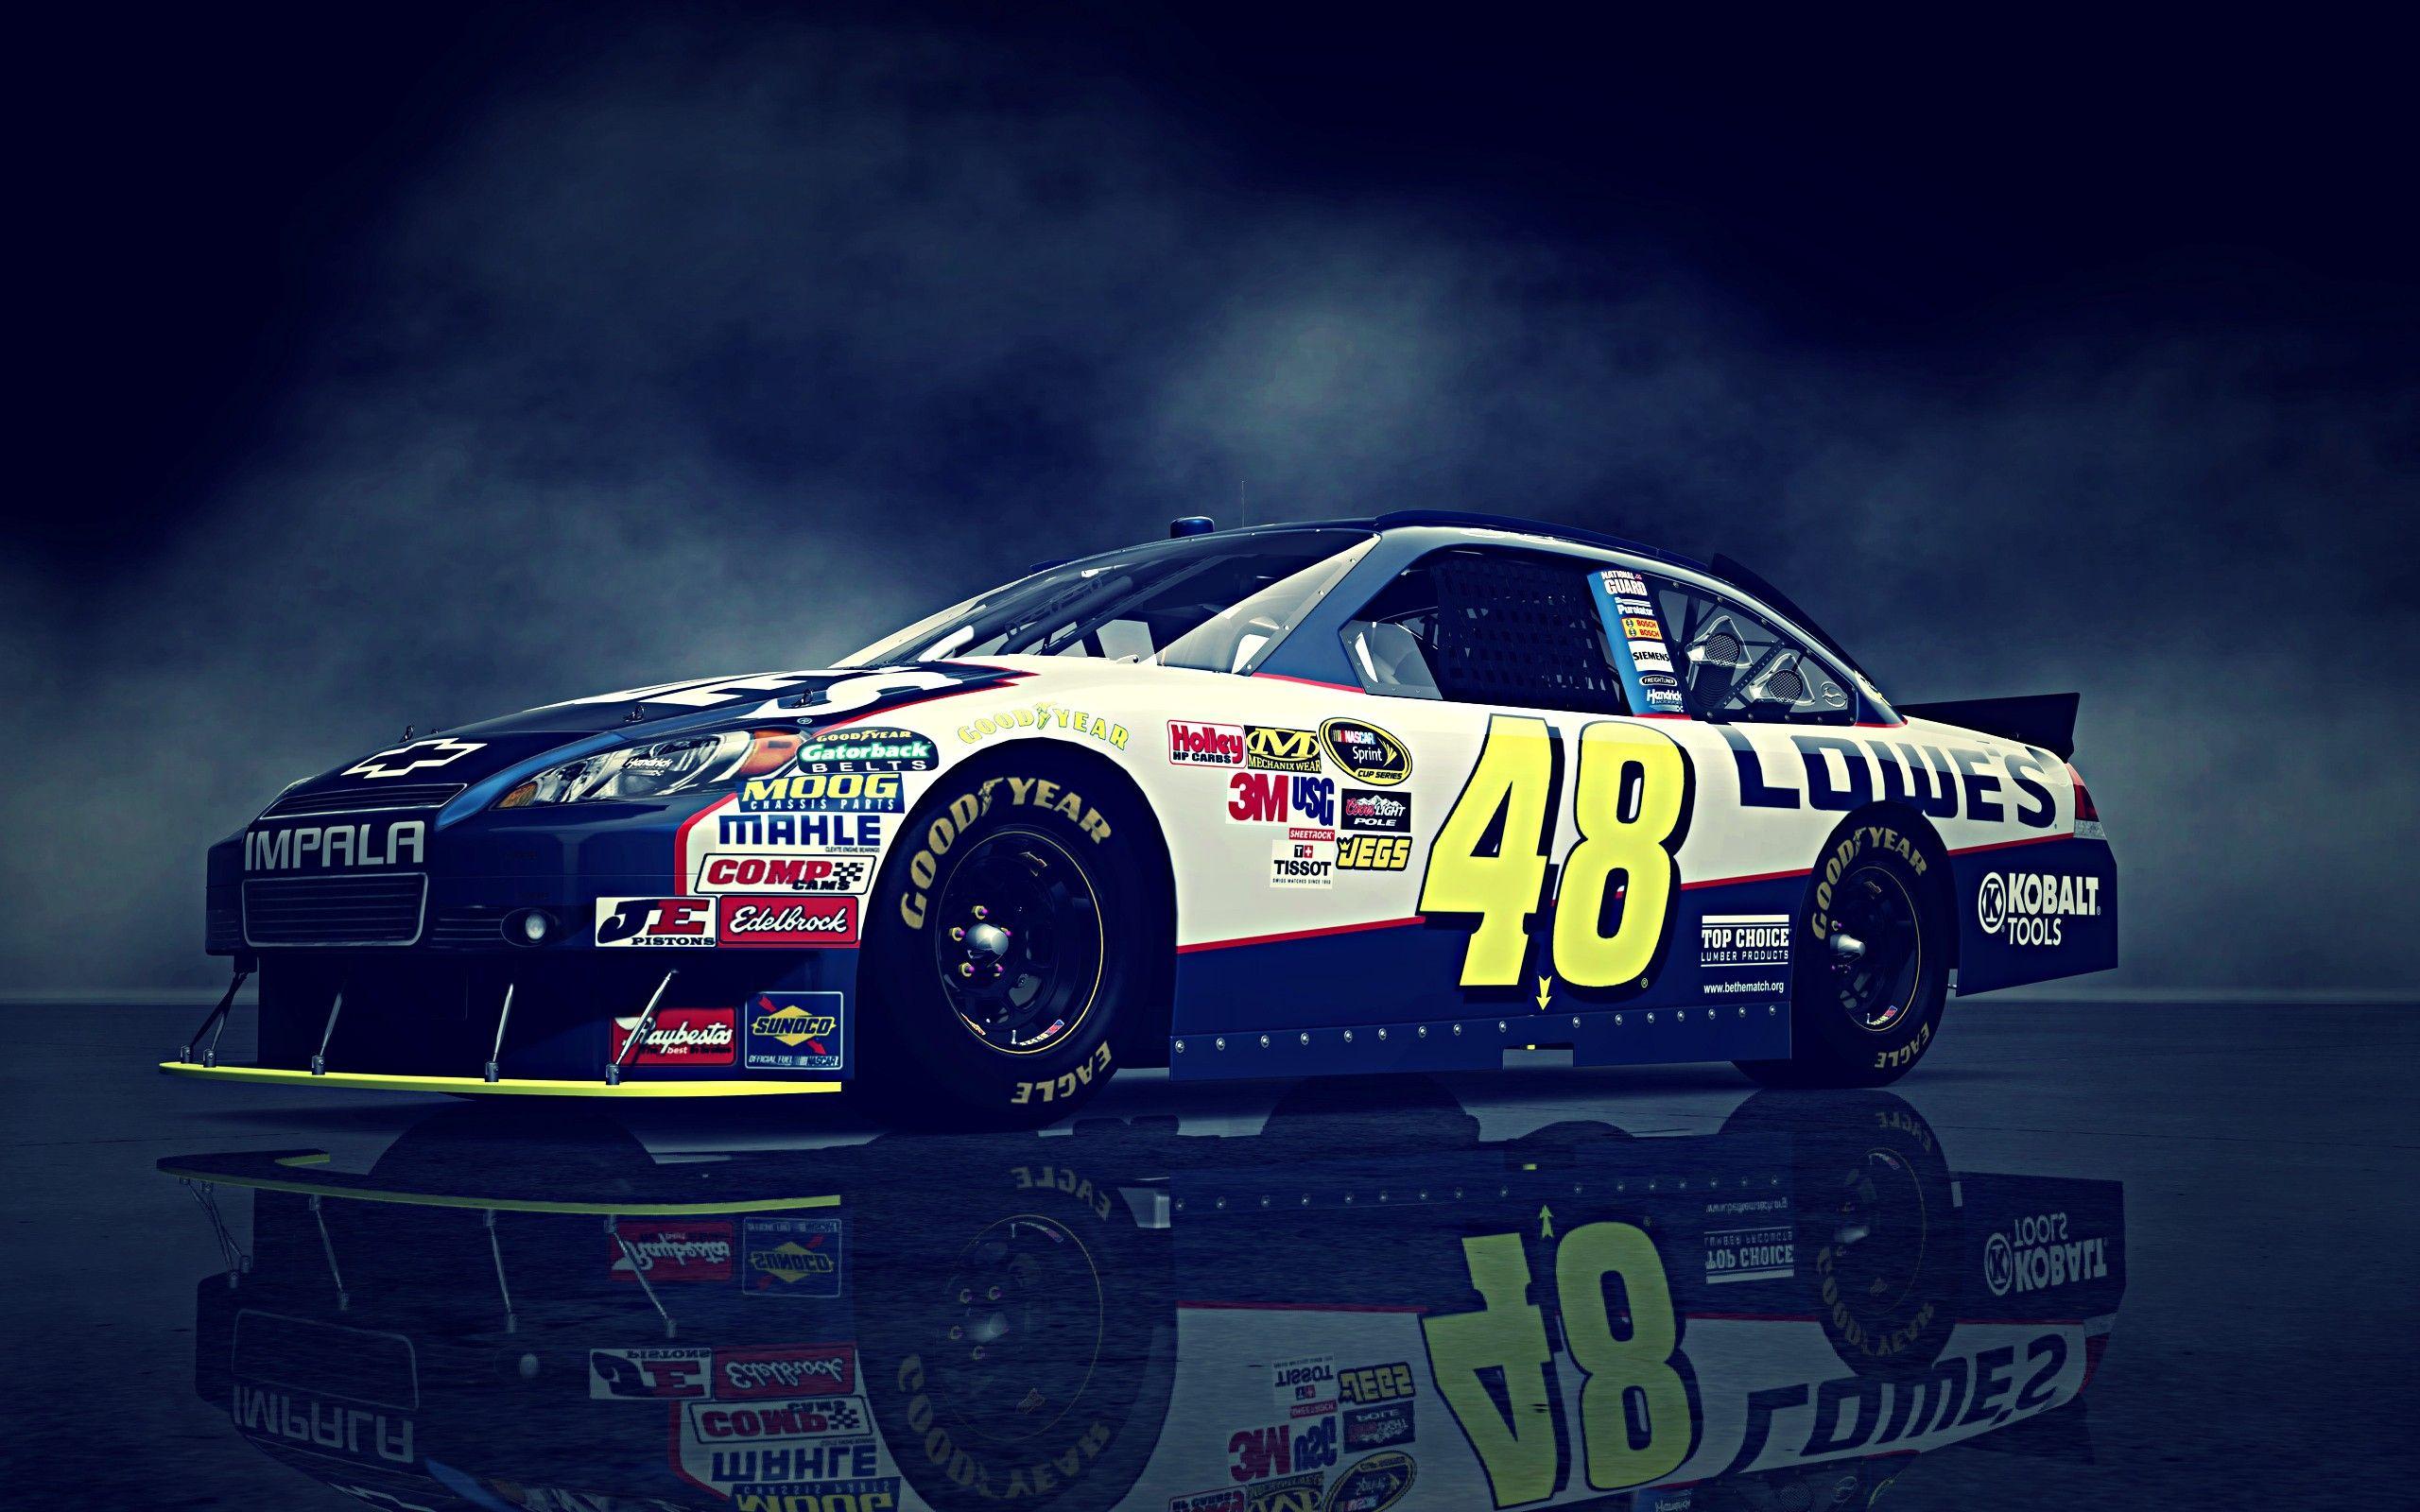 Free Nascar Jimmy Johnson Wallpapers Hd Nascar Race Cars Car Chevrolet Racing